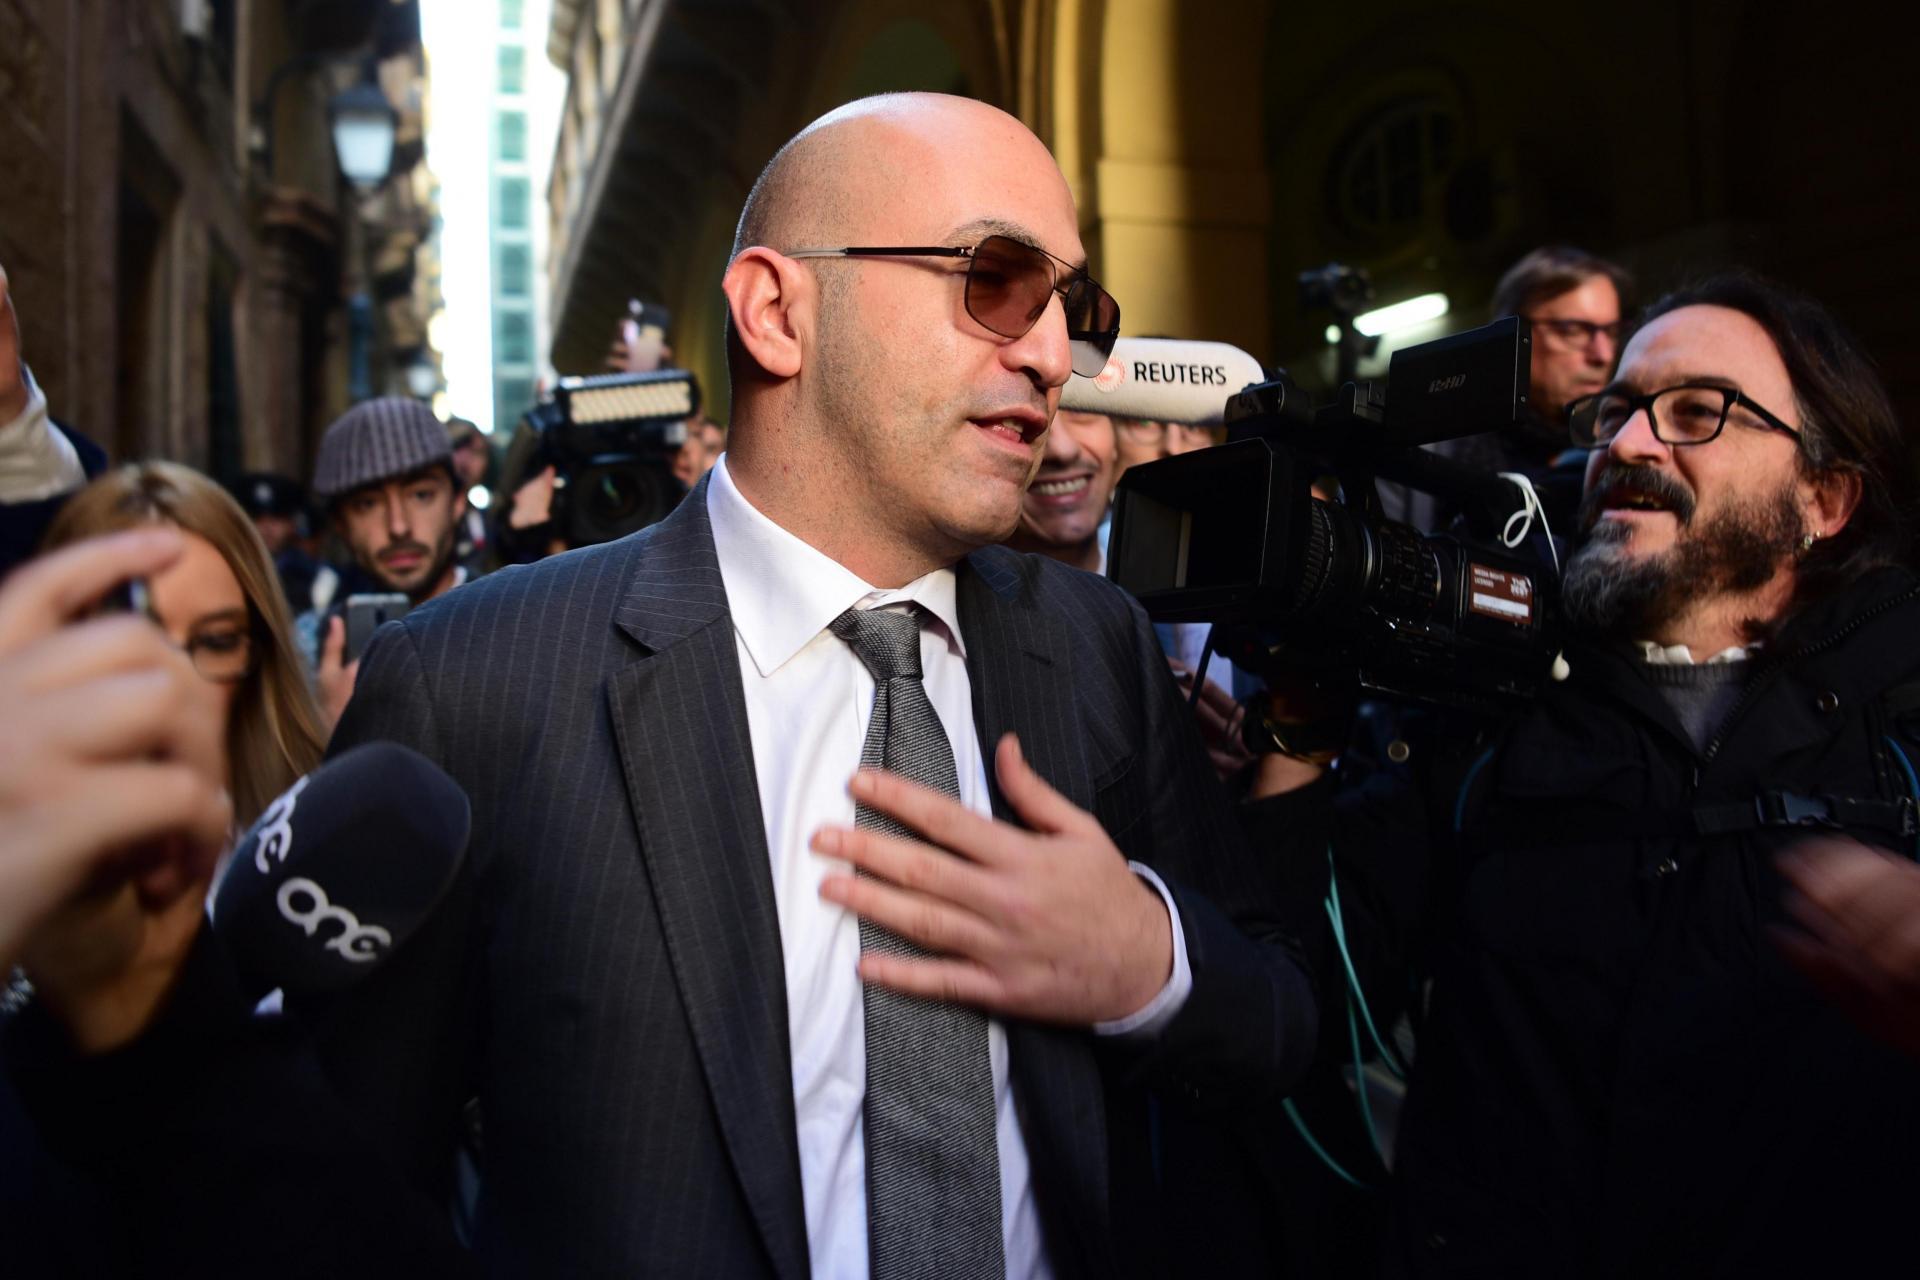 Yorgen Fenech denies conspiring to murder Daphne Caruana Galizia. Photo: Mark Zammit Cordina